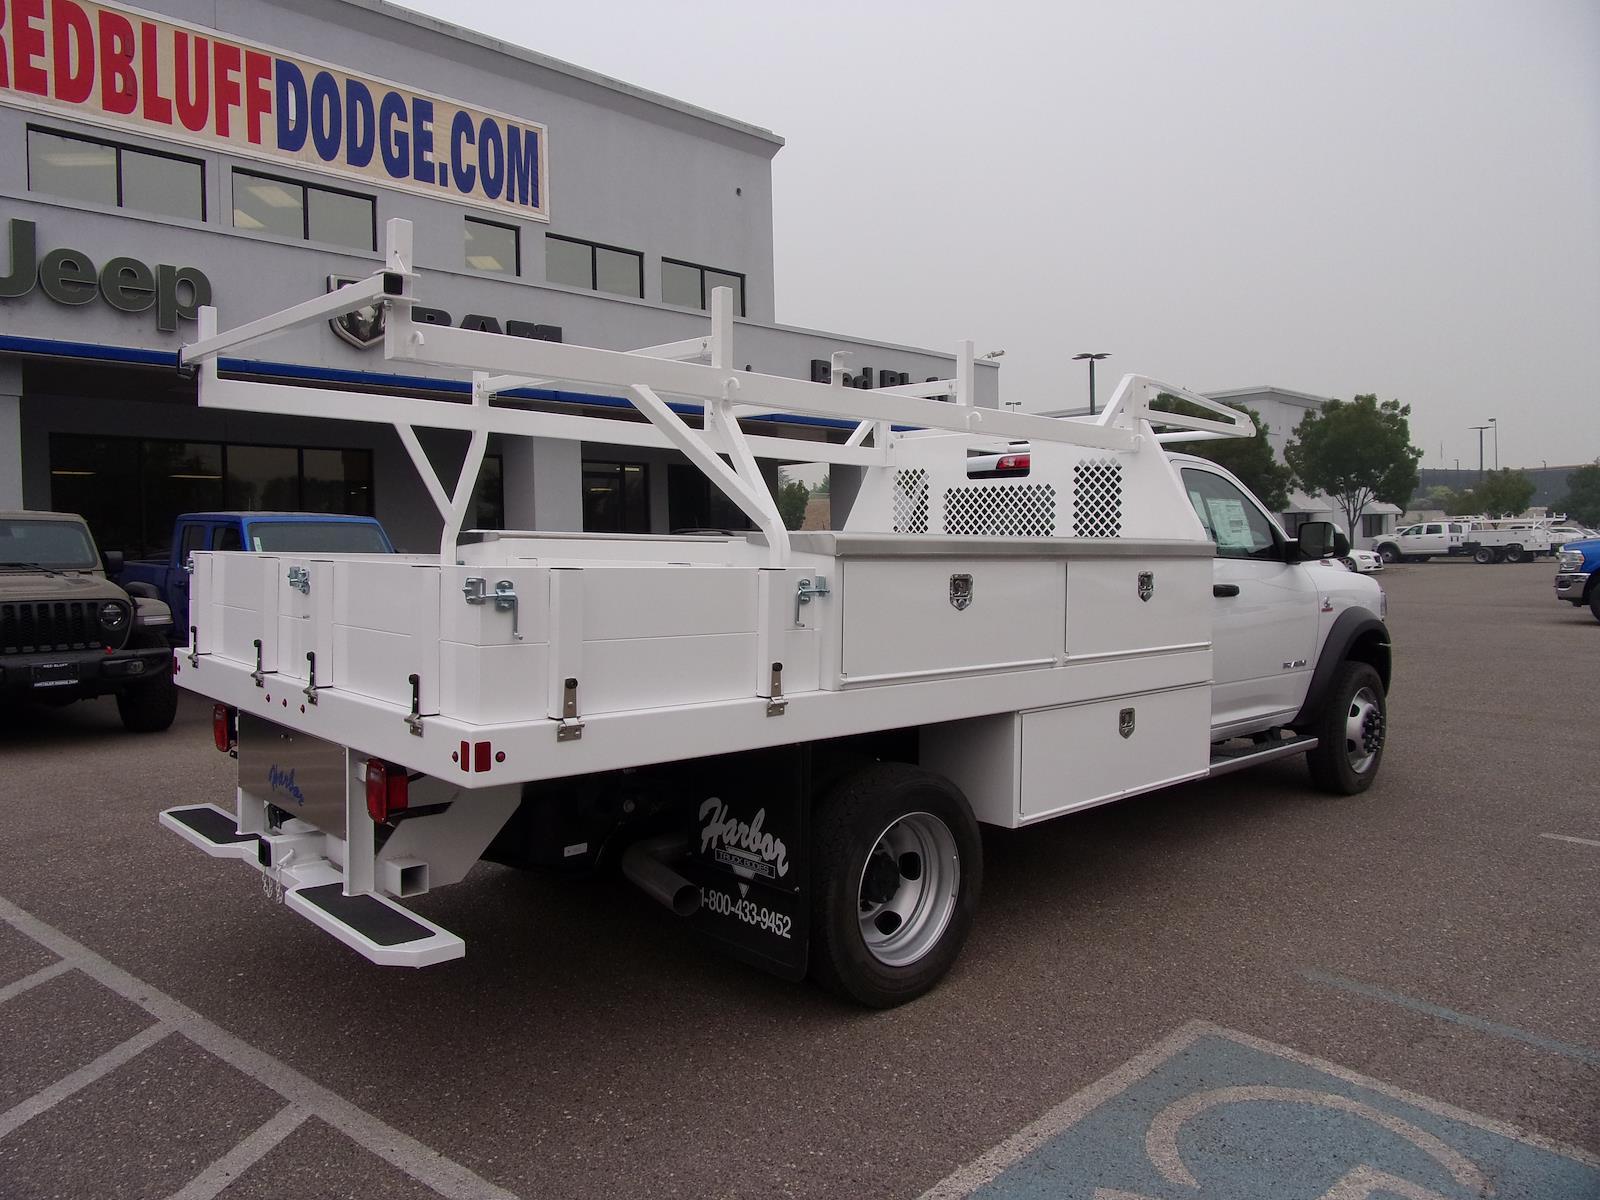 2020 Ram 5500 Regular Cab DRW 4x4, Harbor Contractor Body #18119 - photo 1